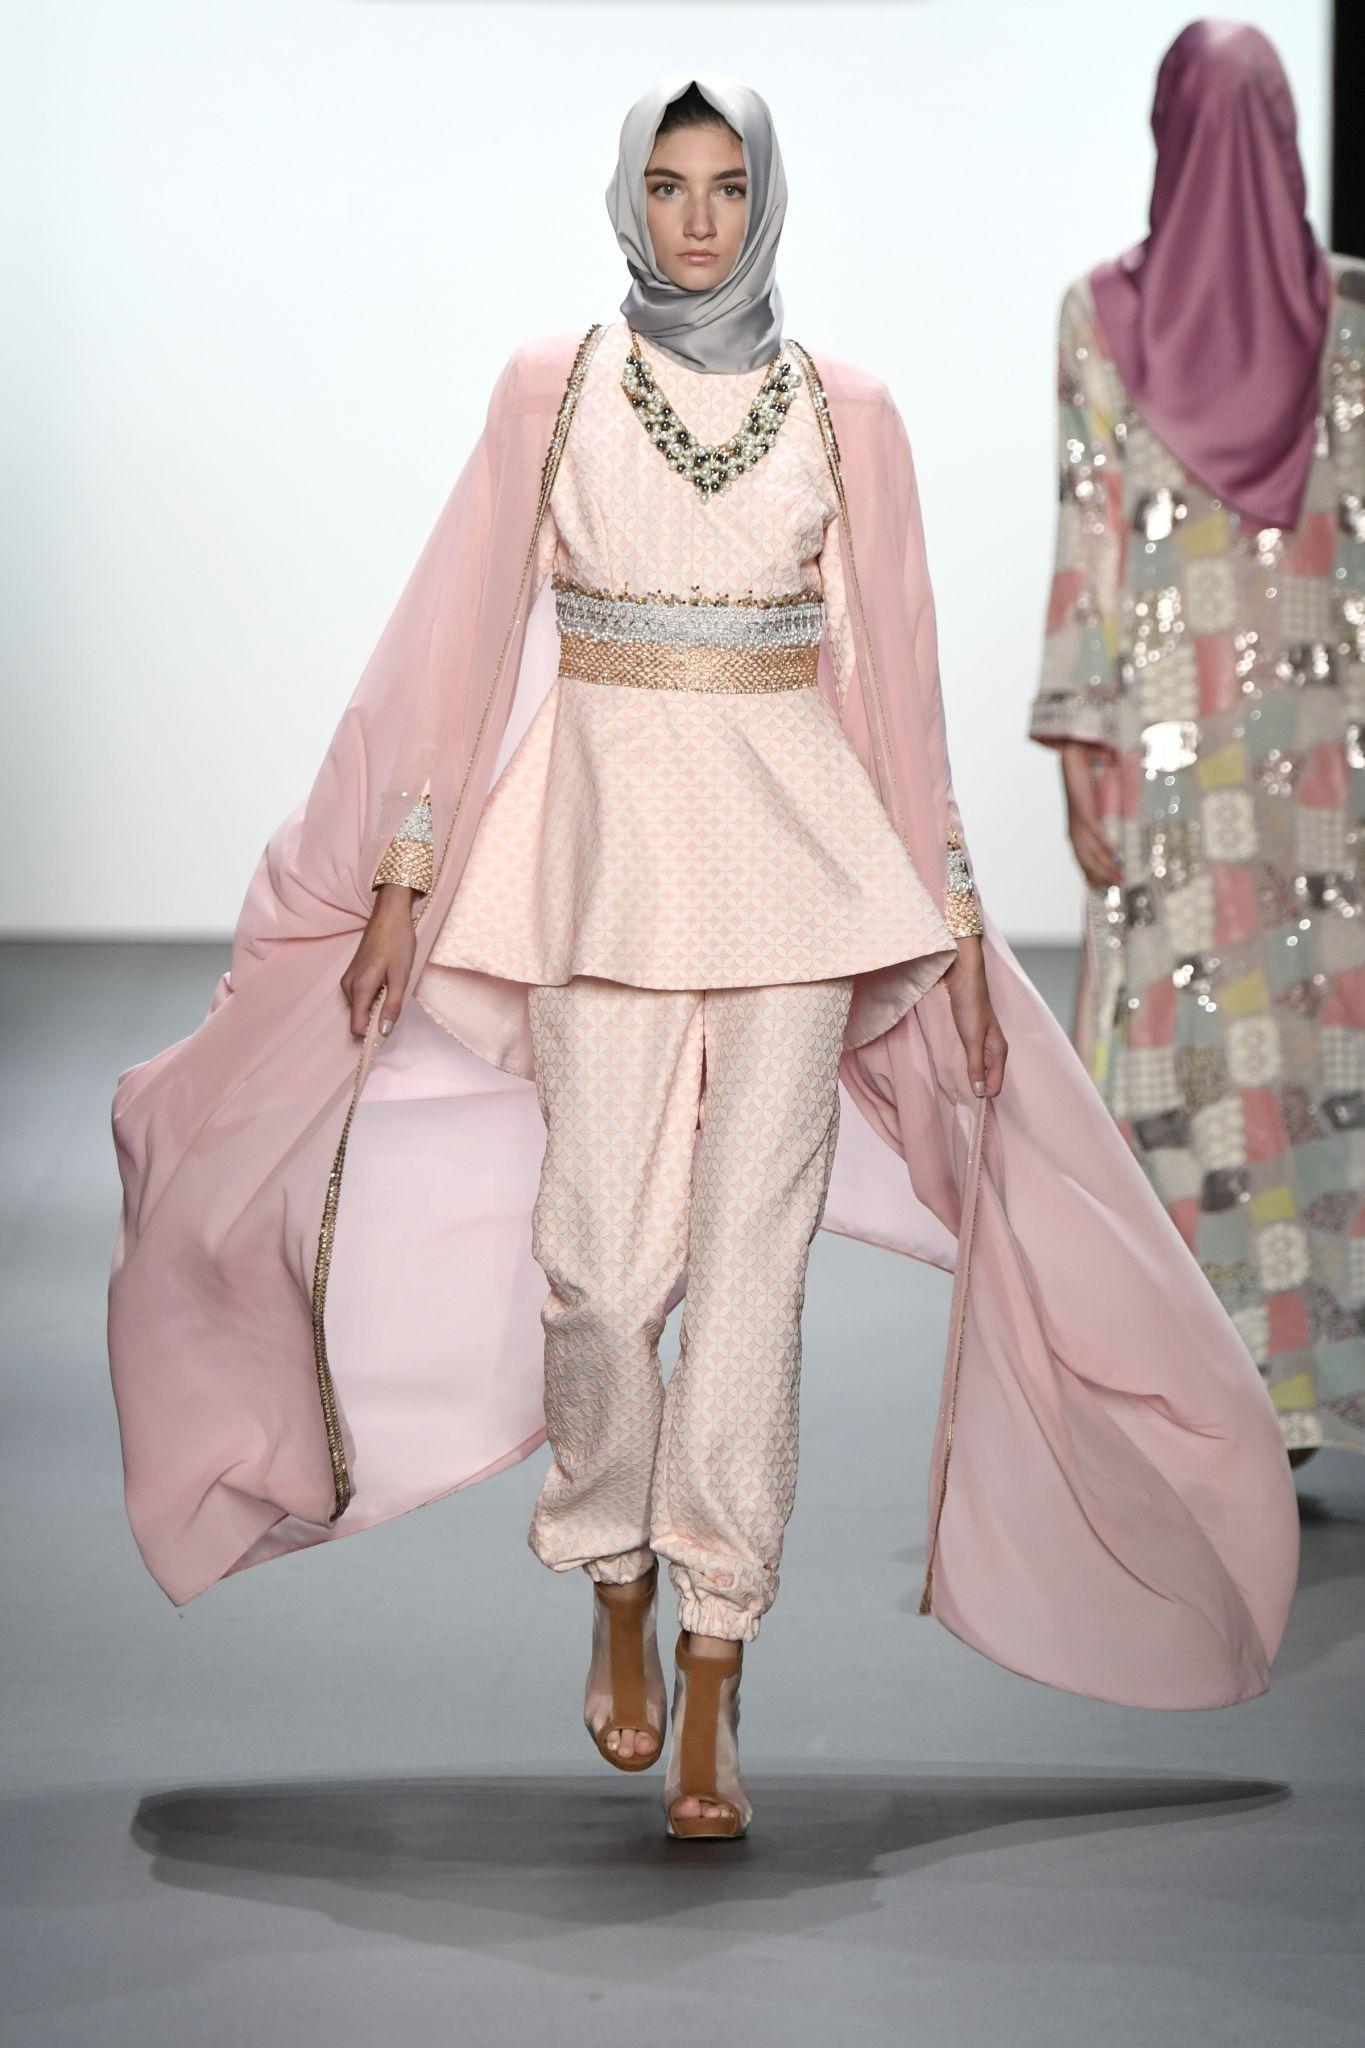 Muslim Designer Creates Amazing Hijab Fashion For New York